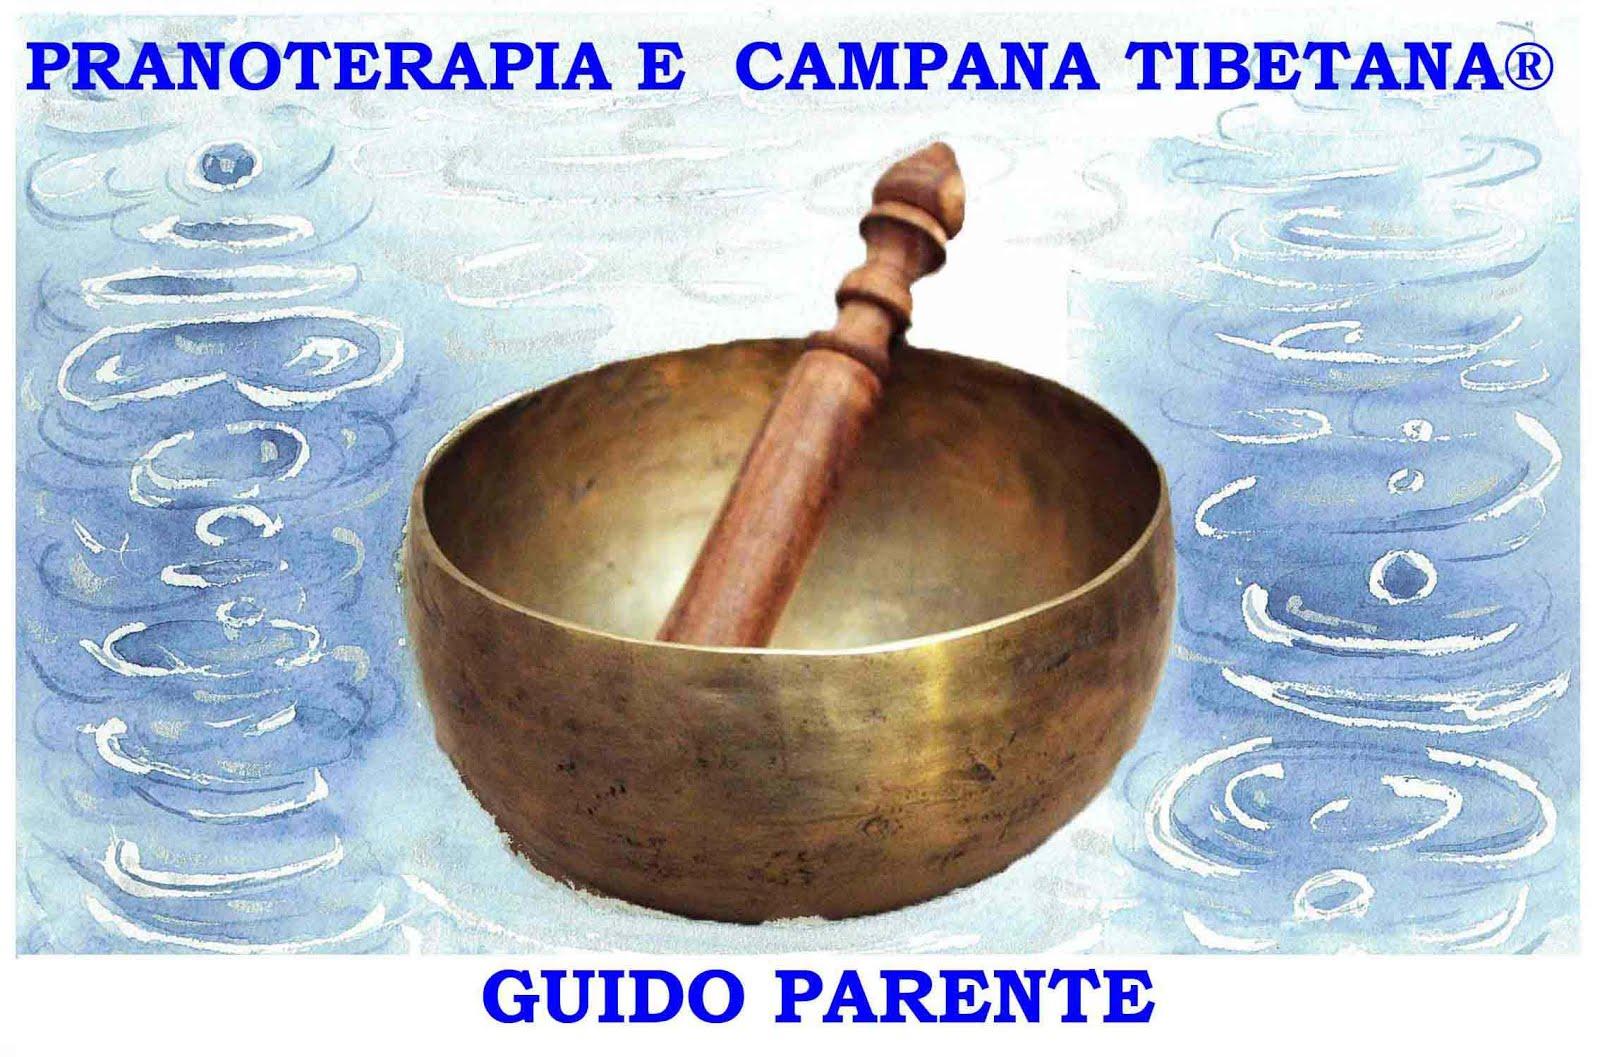 Pranoterapia e Campana Tibetana